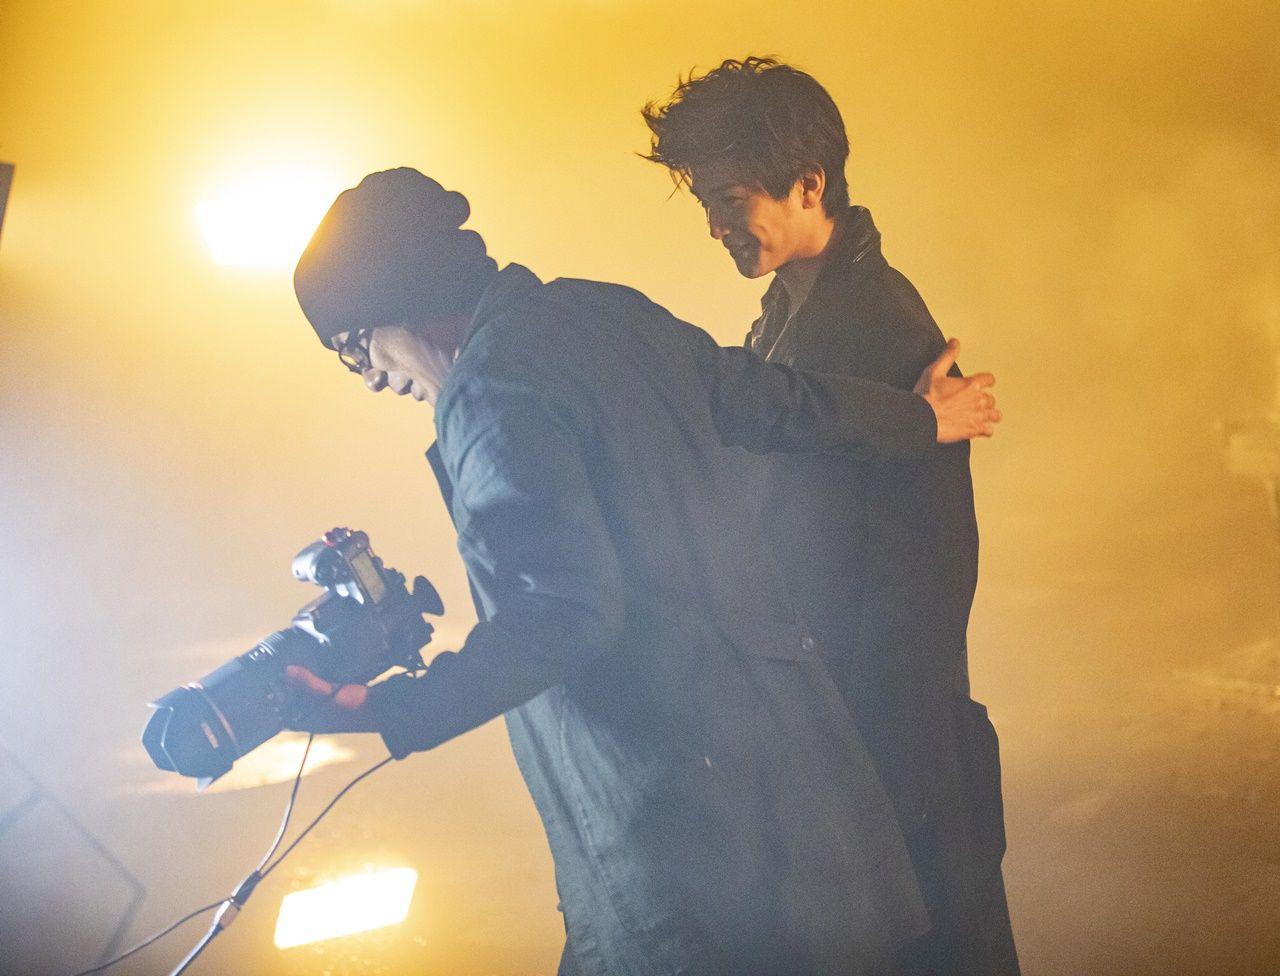 撮影:永瀬正敏/岩田剛典3rd写真集『SPIN』(講談社)より